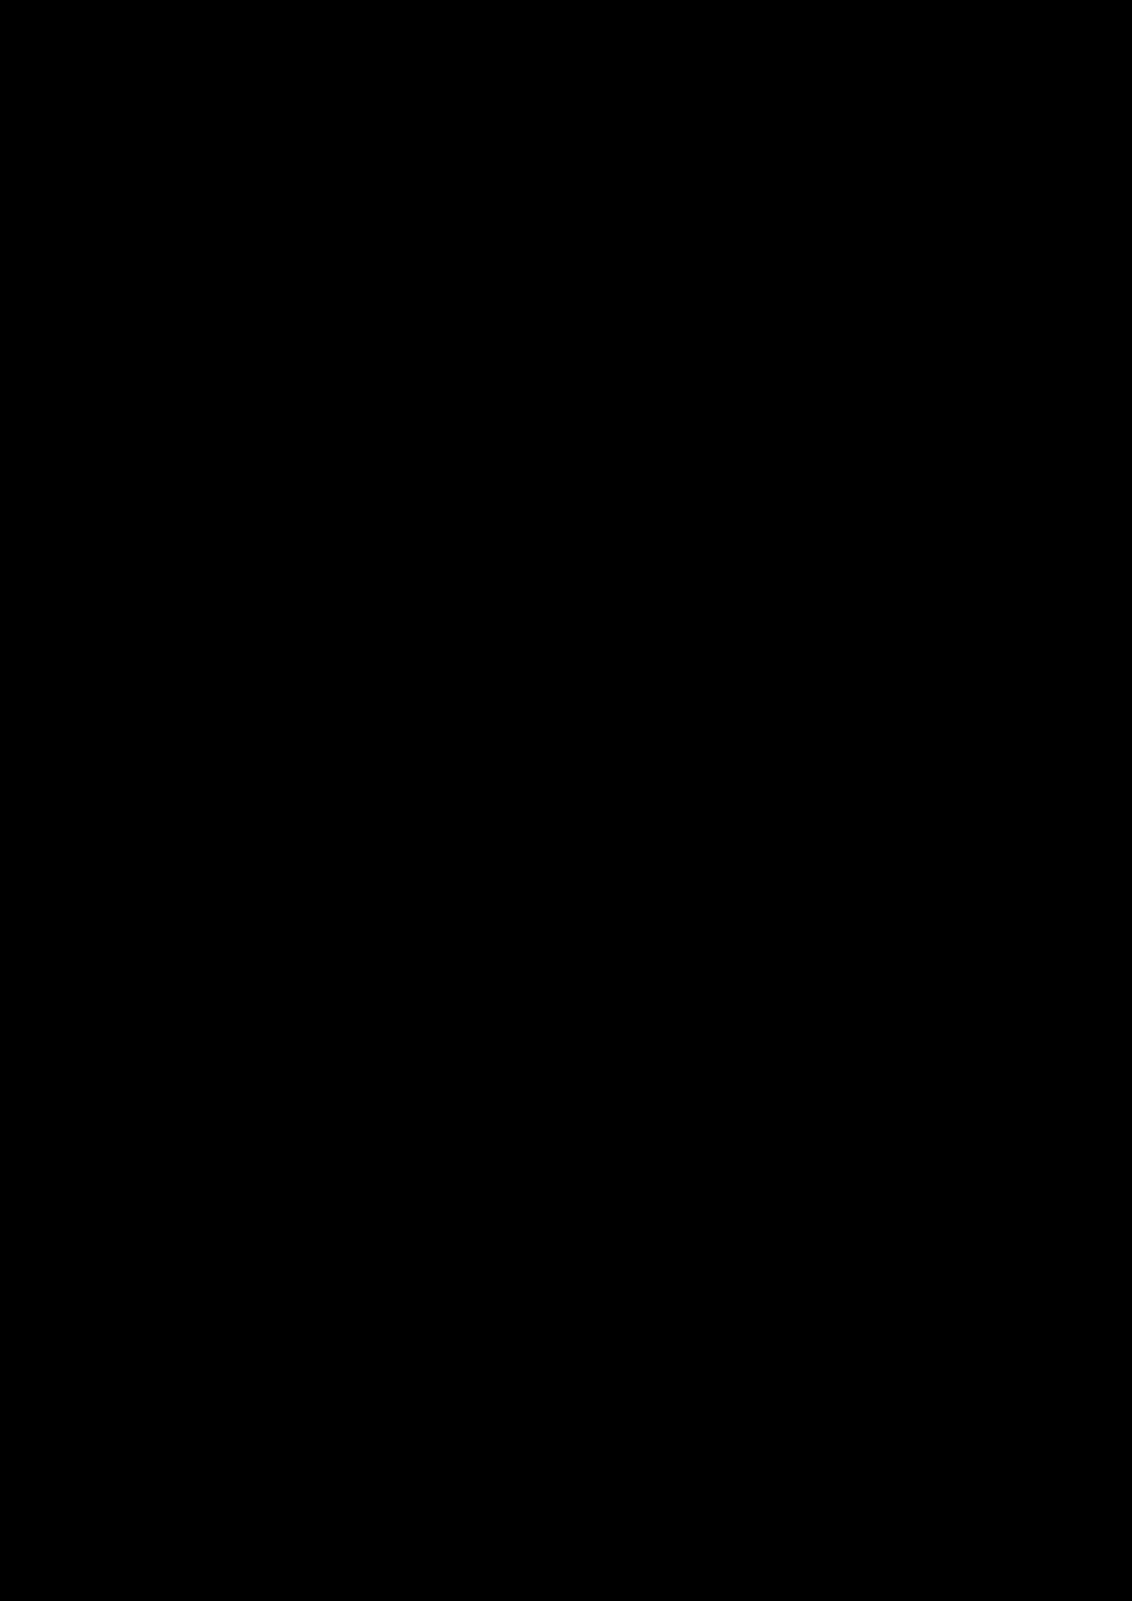 Menshe nas slide, Image 7